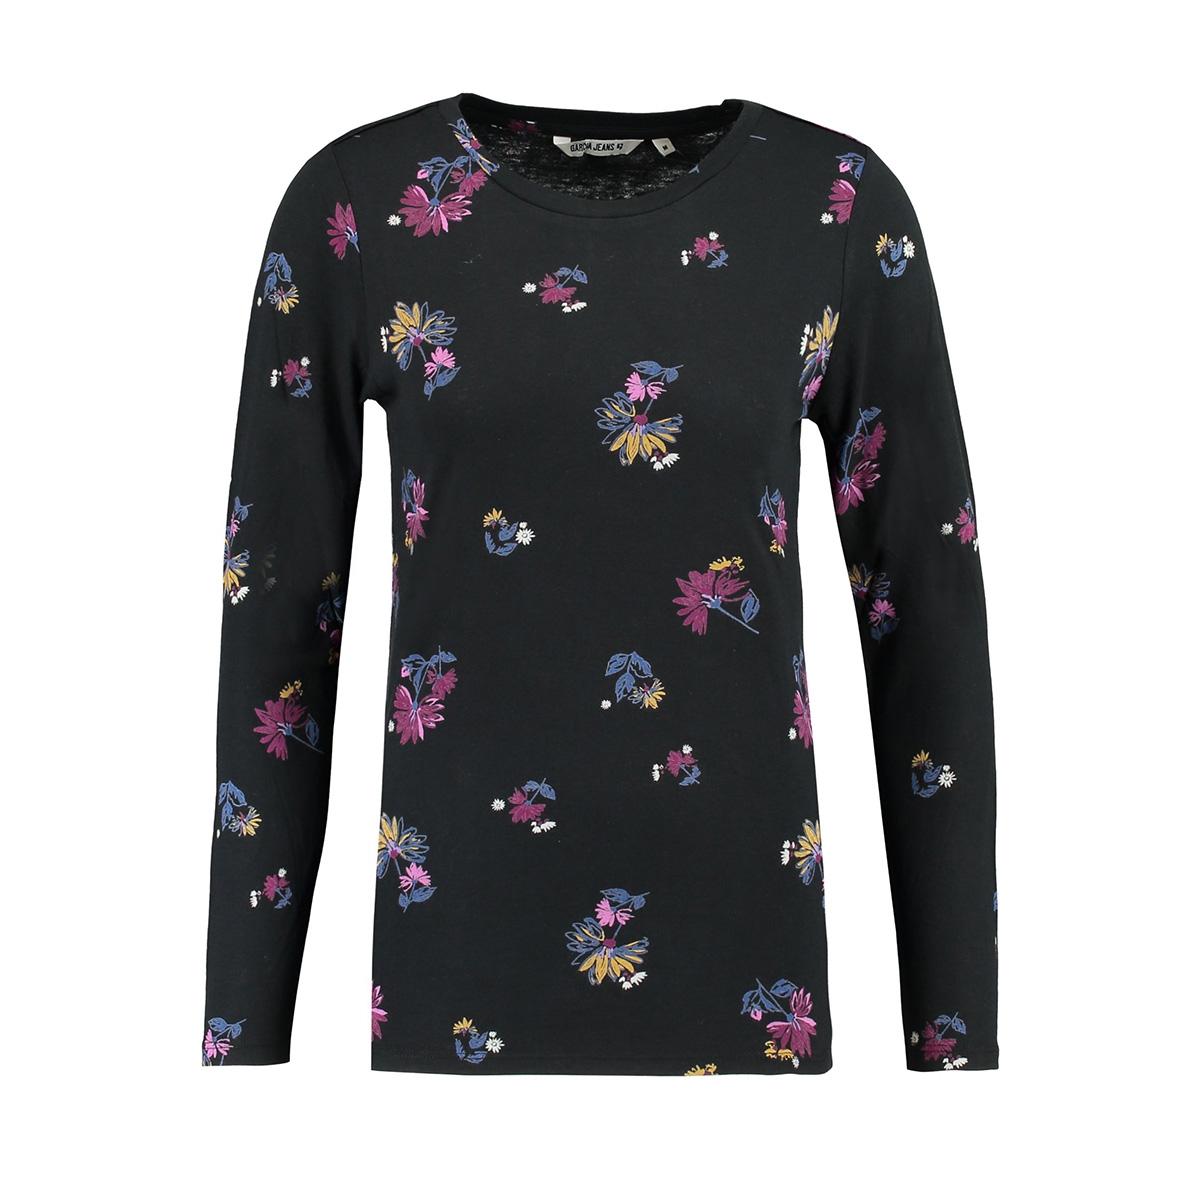 v80223 garcia t-shirt 60 black